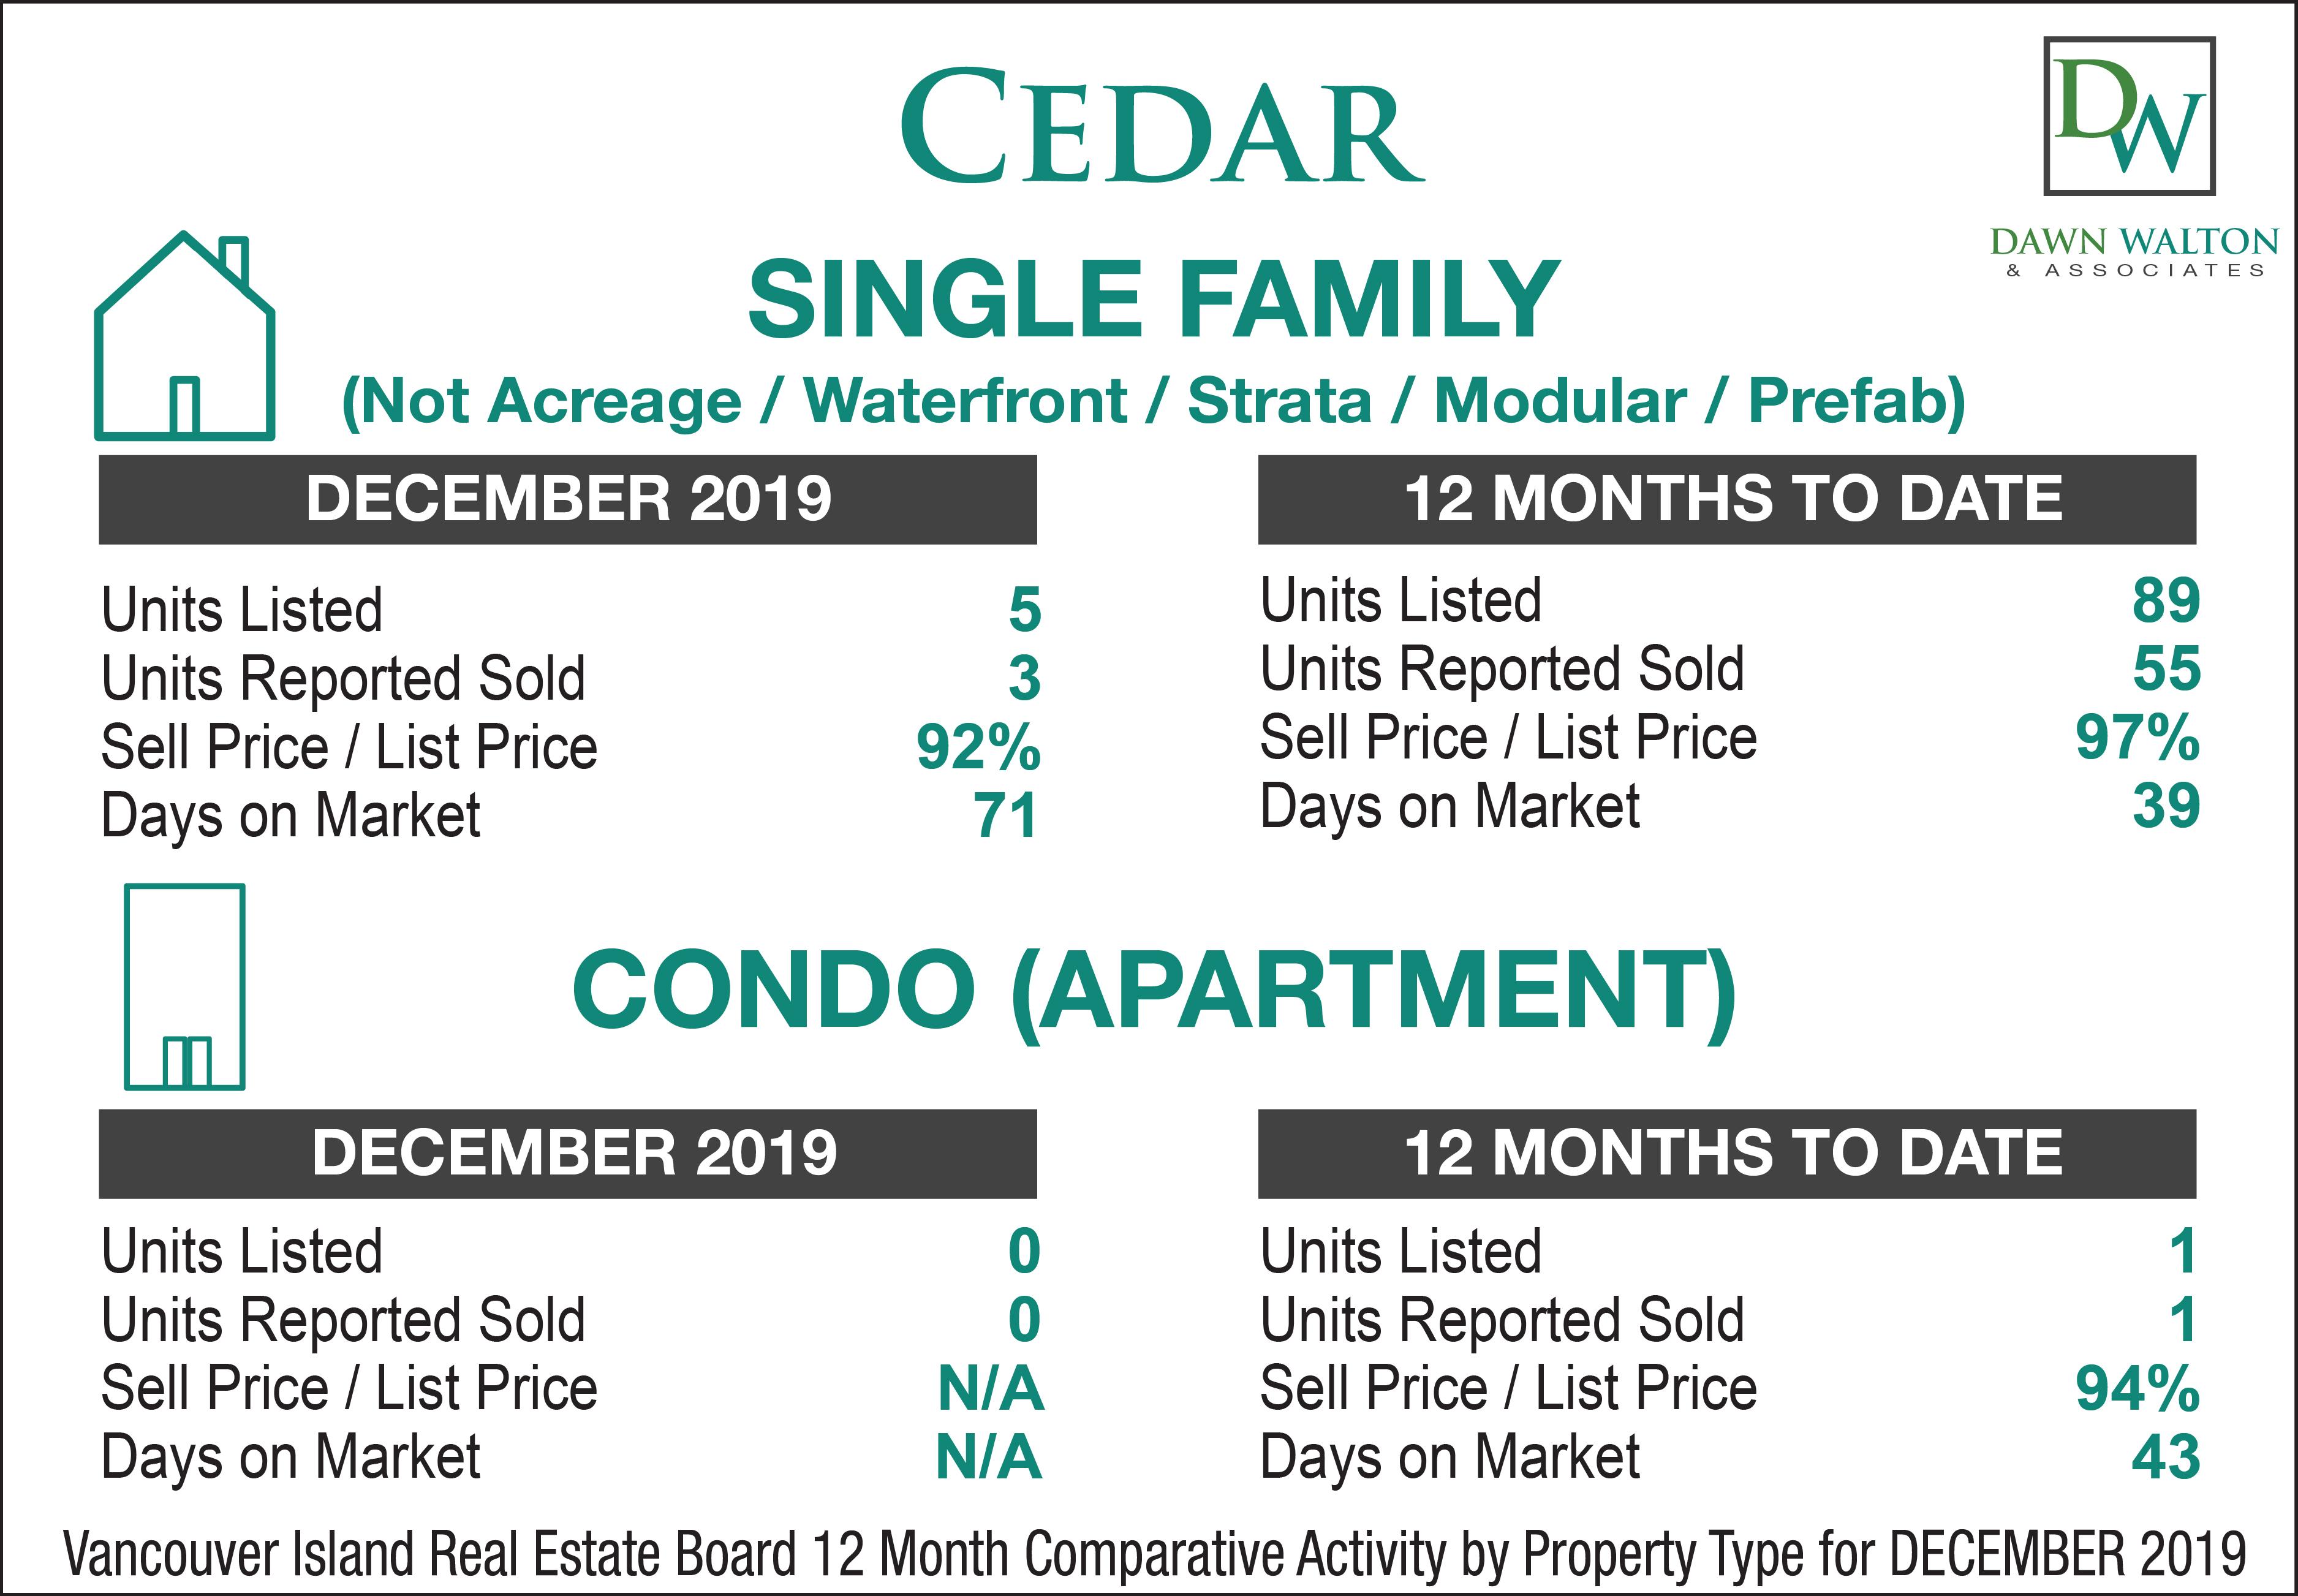 Cedar - Yellow Point Real Estate Market Stats December  2019 - Nanaimo Realtor Dawn Walton